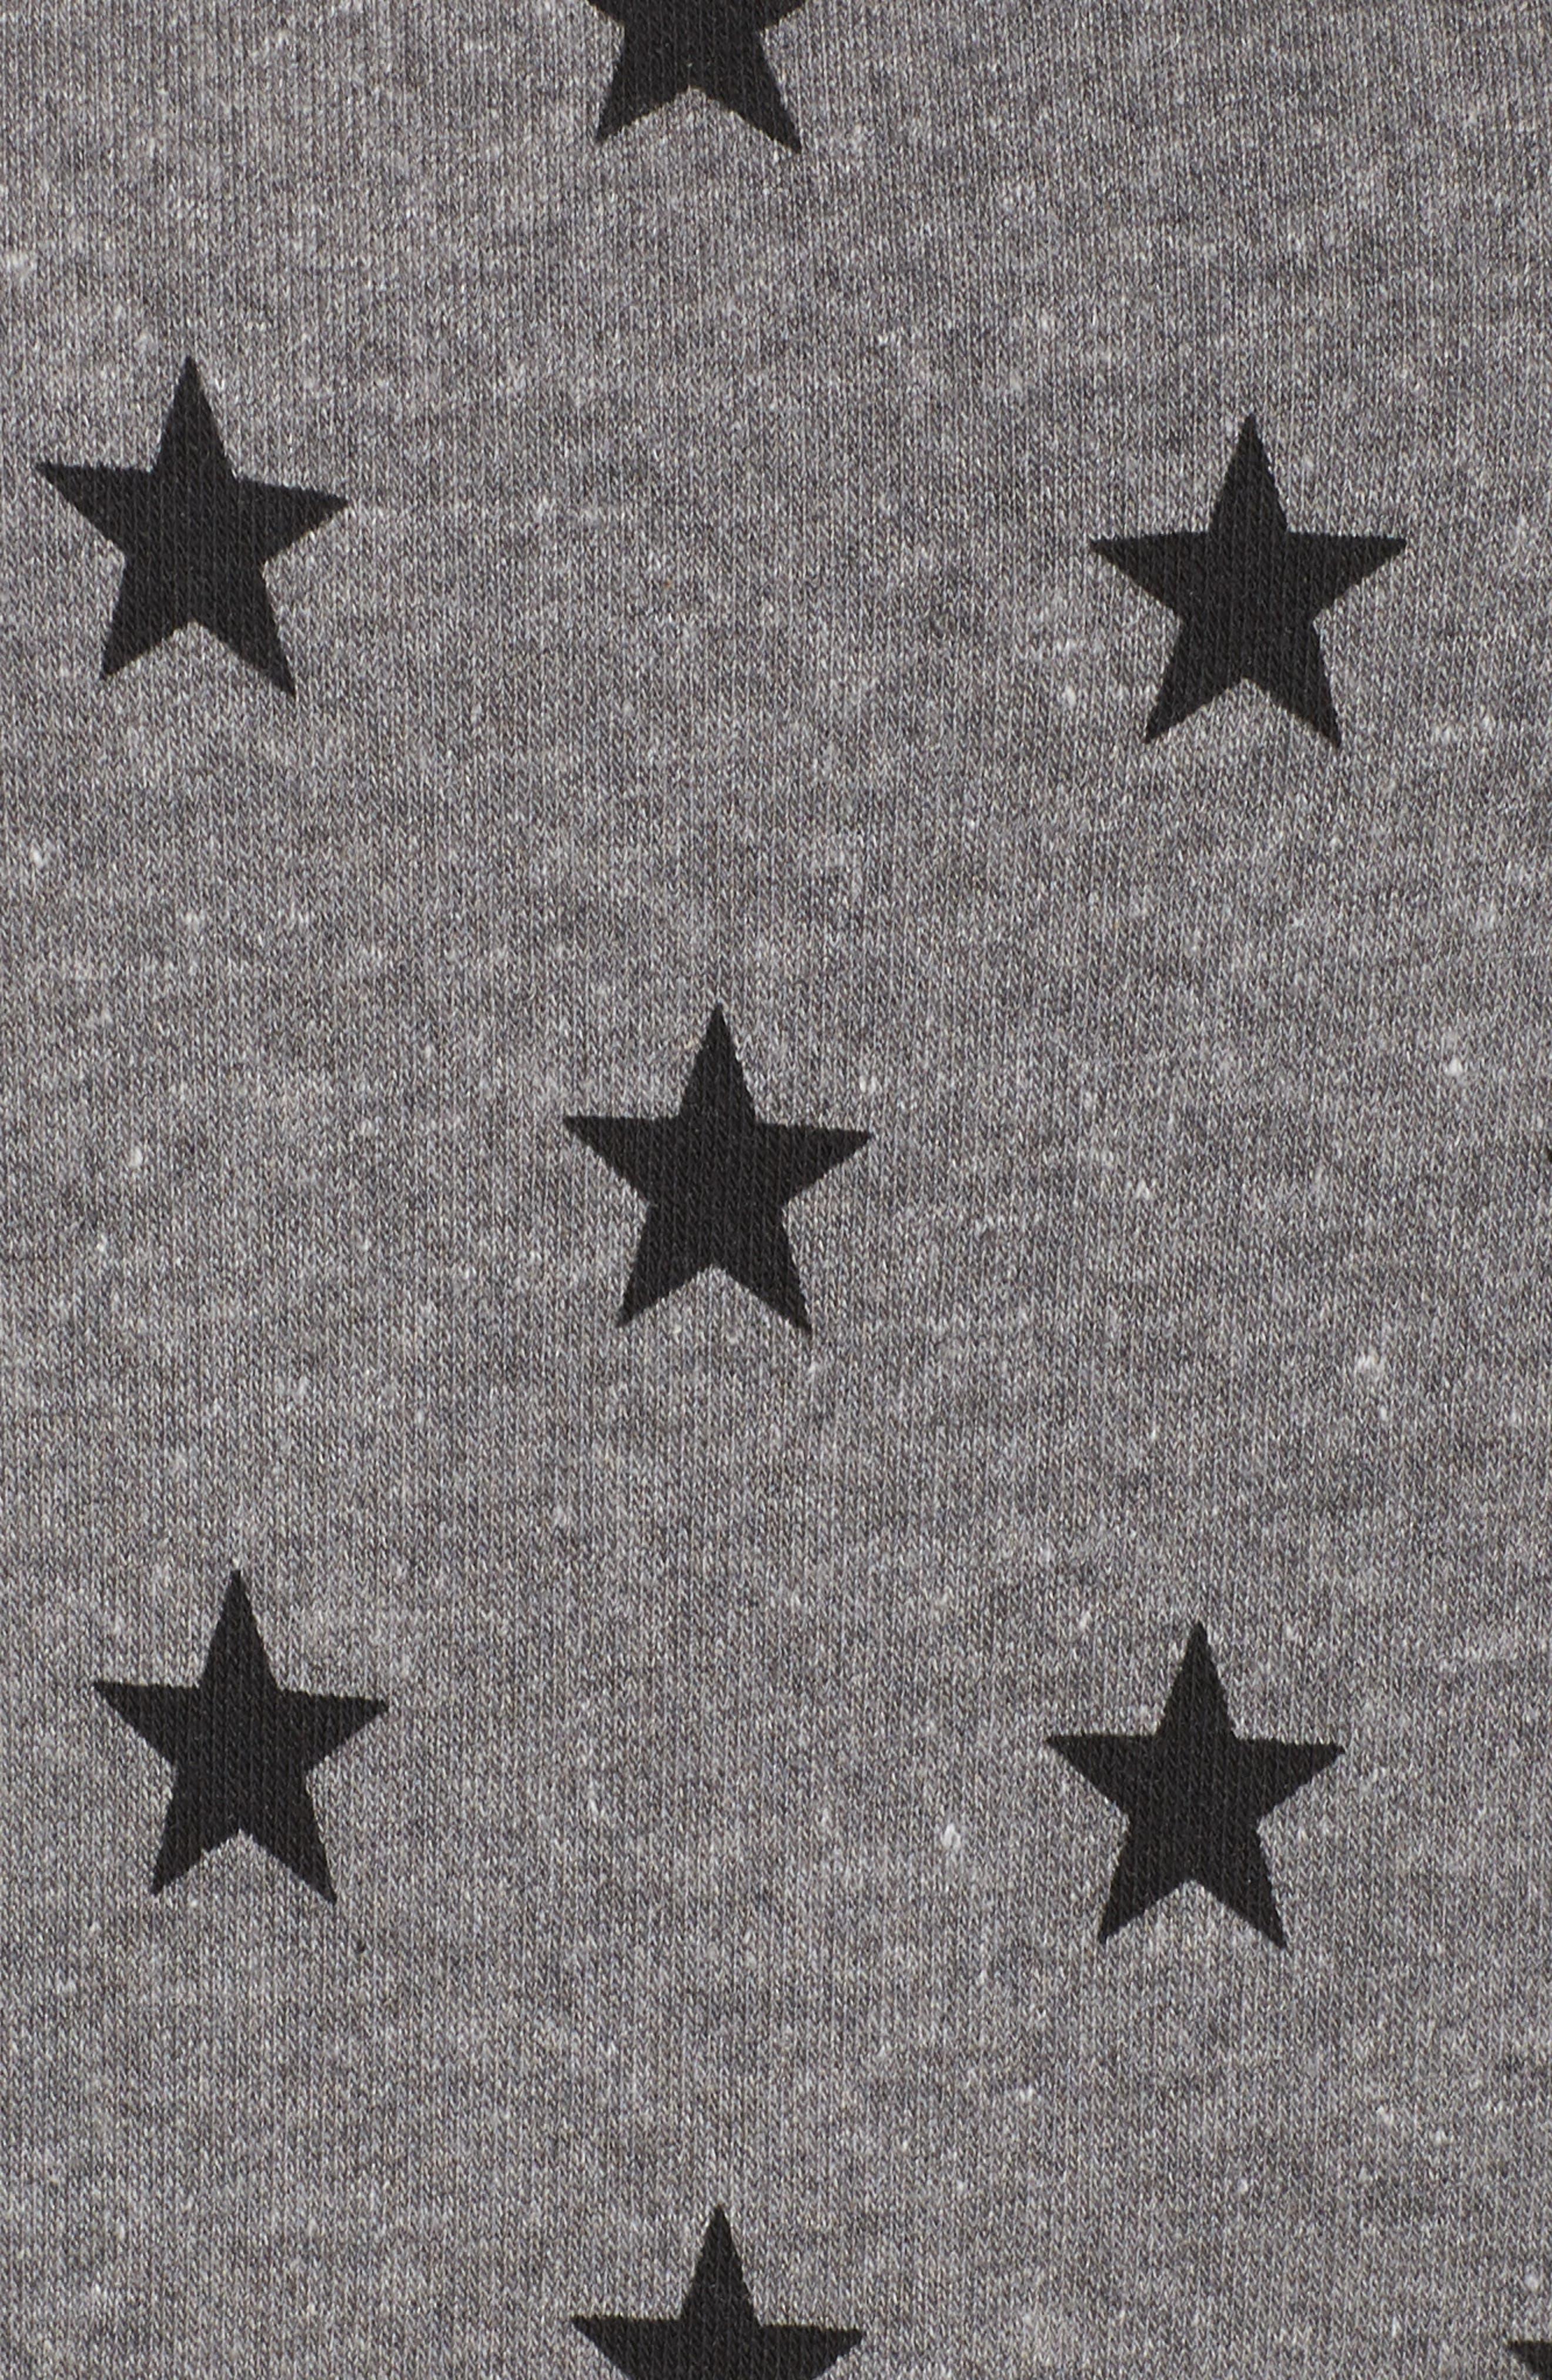 Maniac Camo Fleece Sweatshirt,                             Alternate thumbnail 5, color,                             Eco Grey Stars